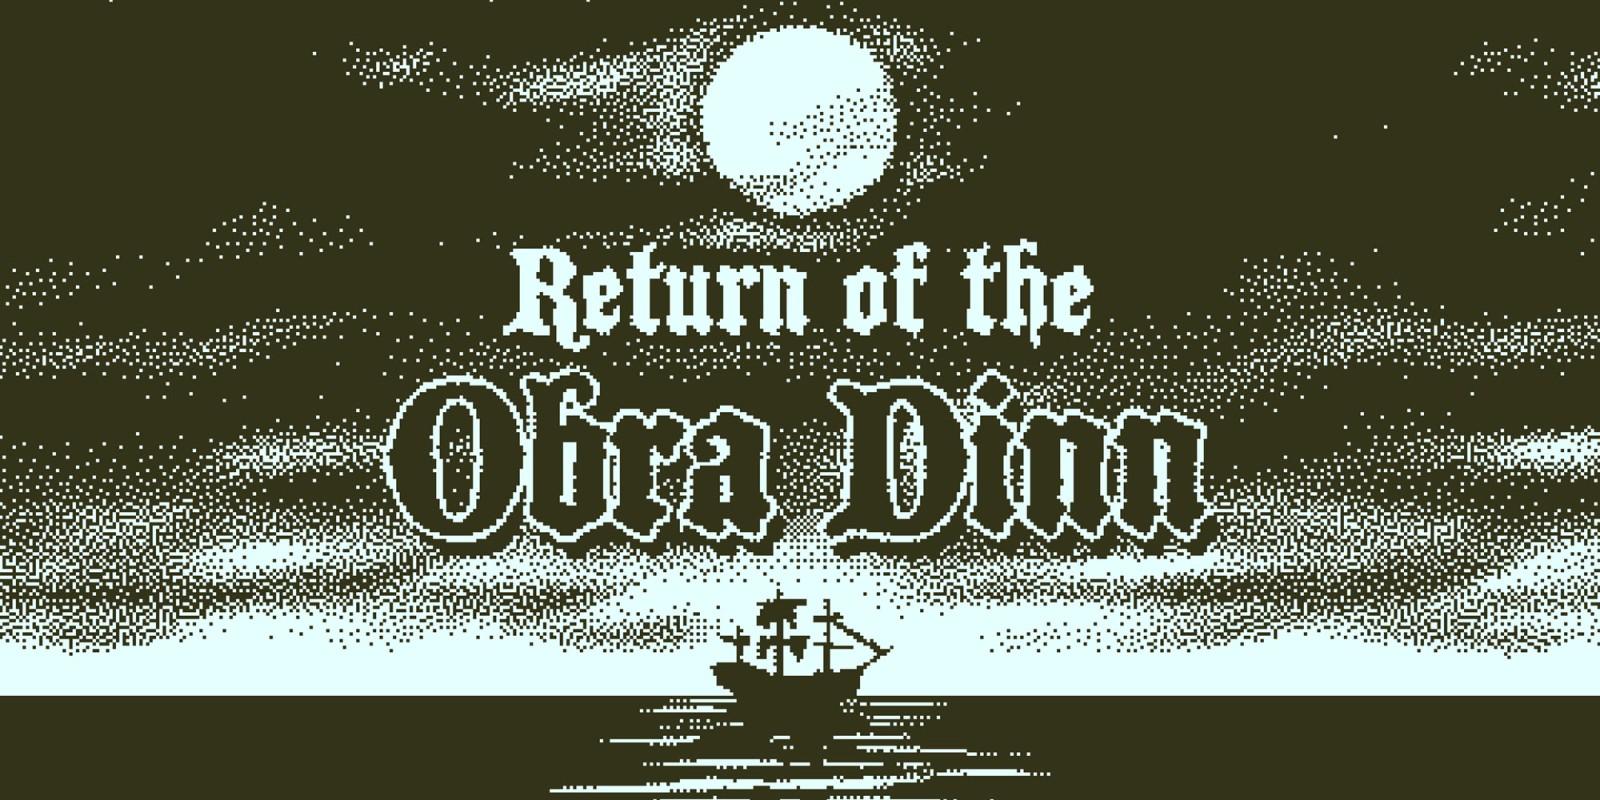 Return of the Obra Dinn al 50%